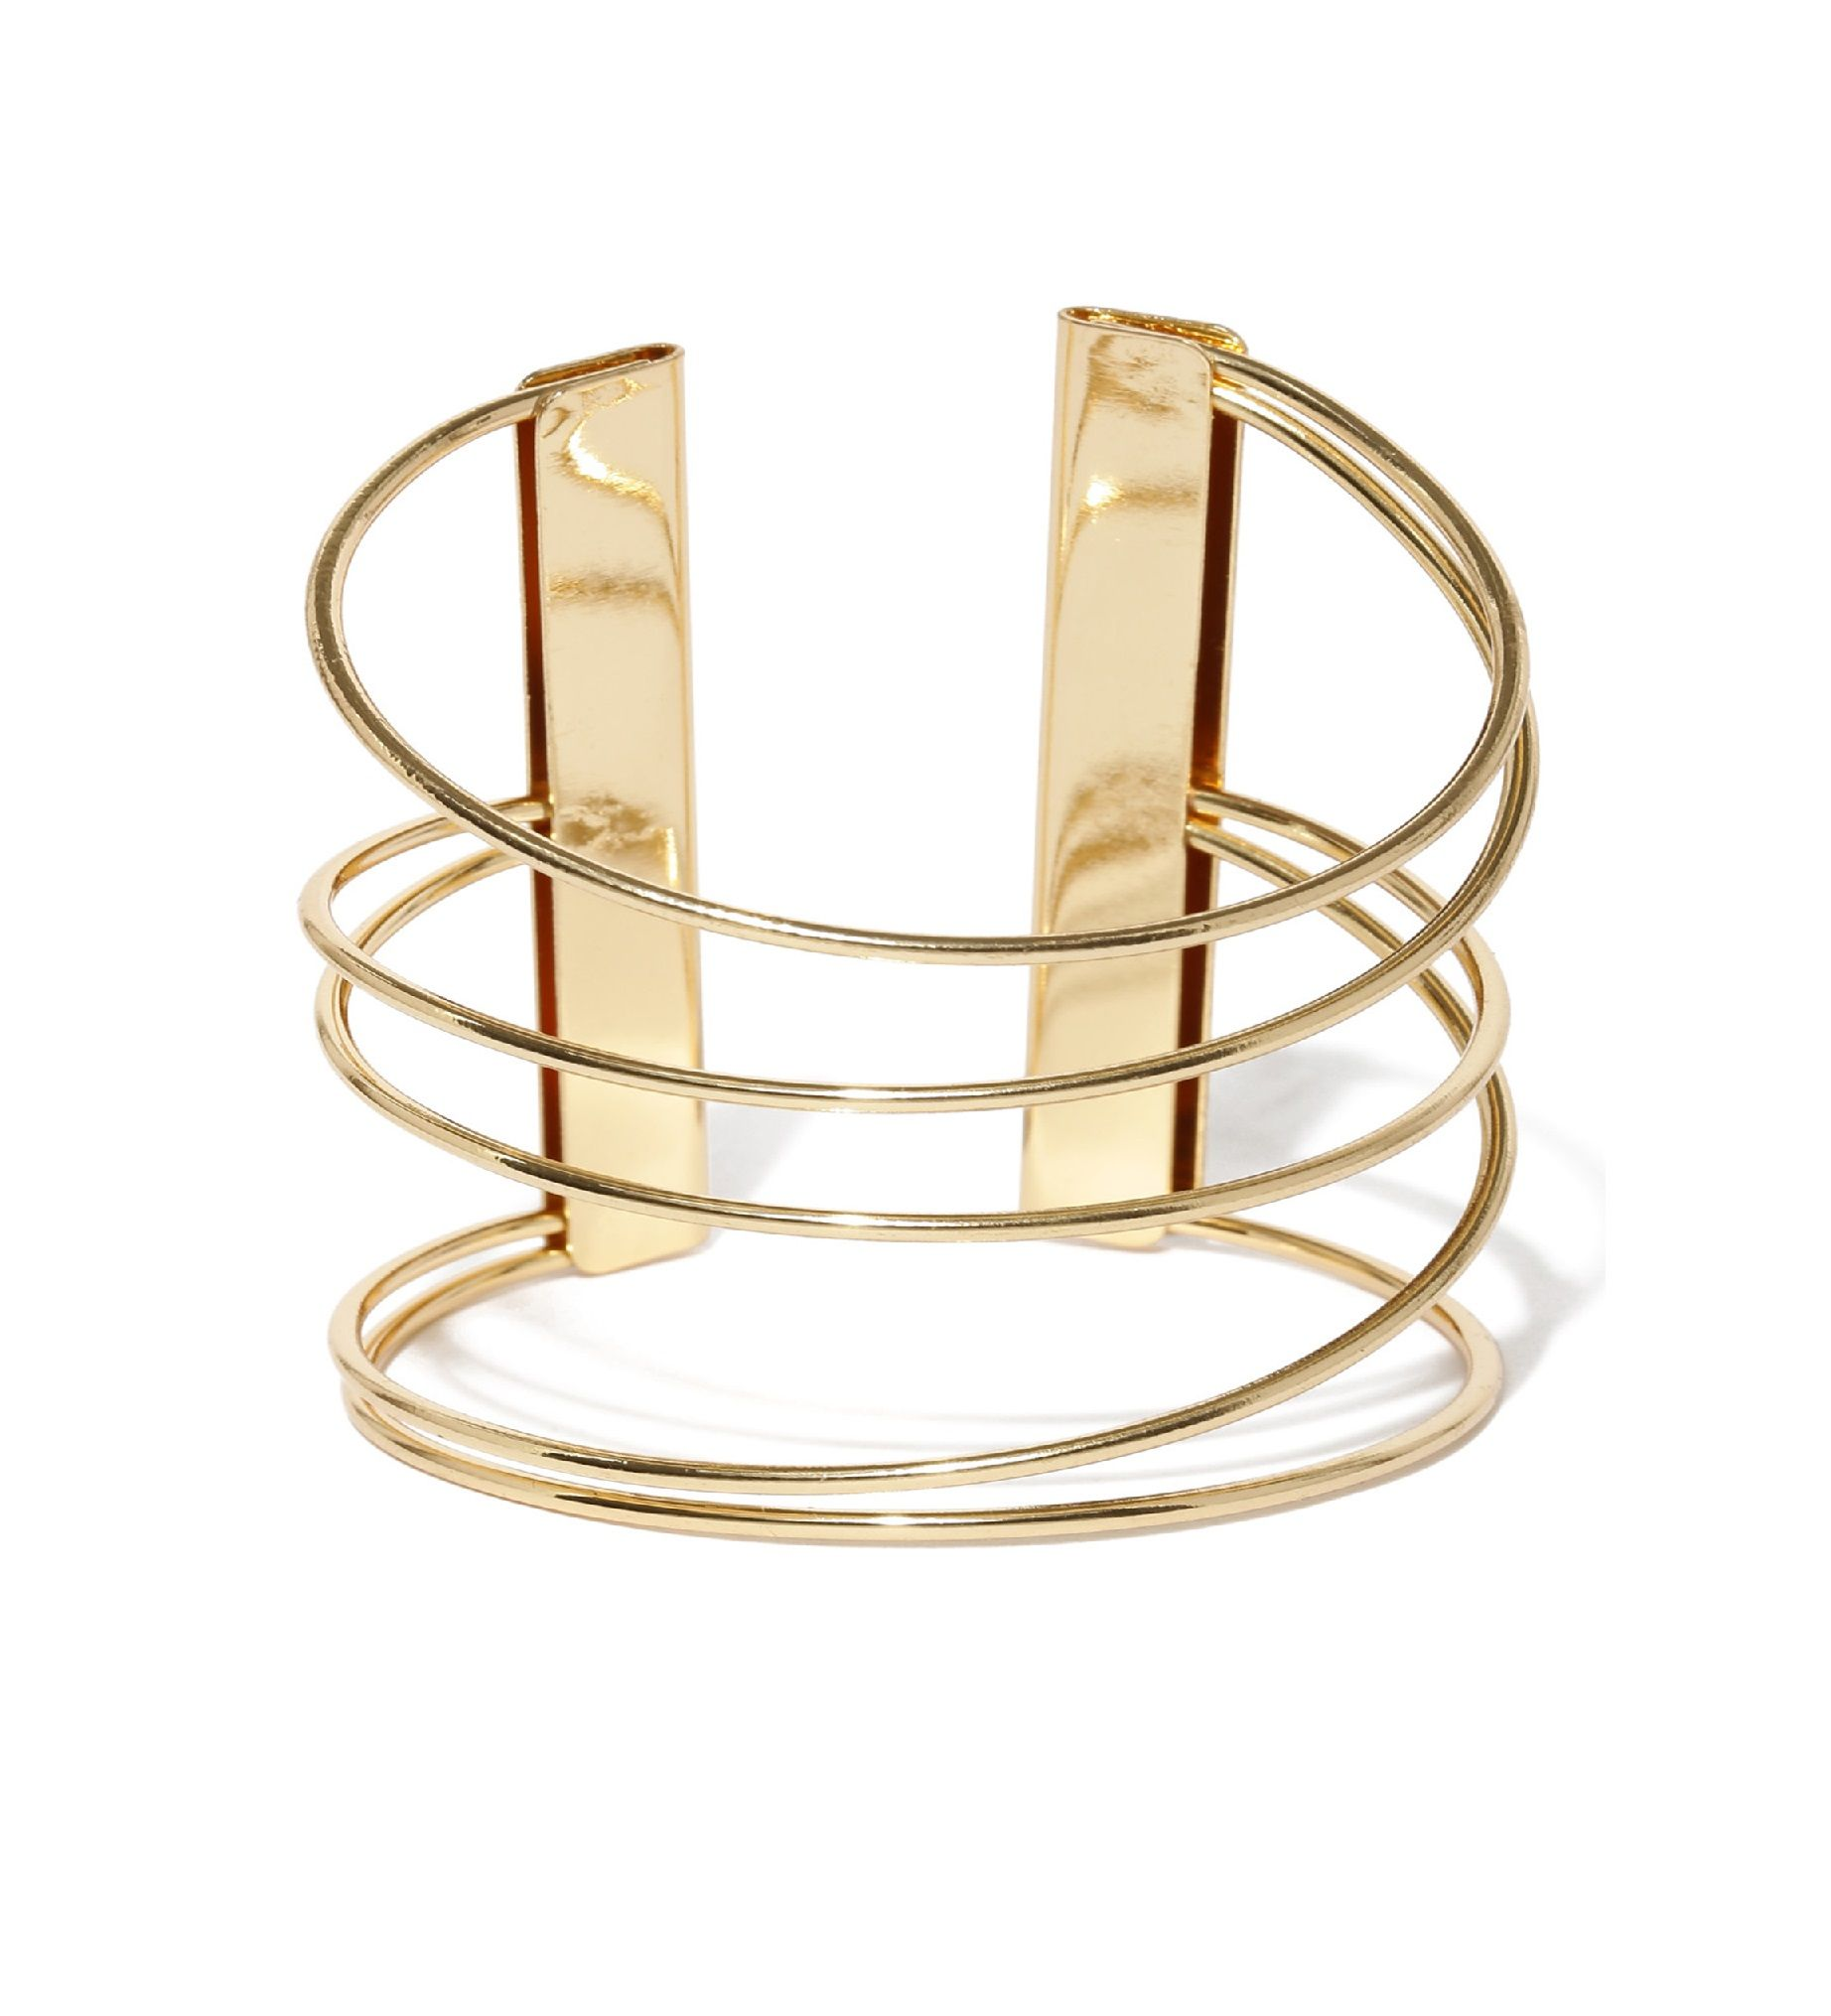 Toniq Gold Swirl Cuff